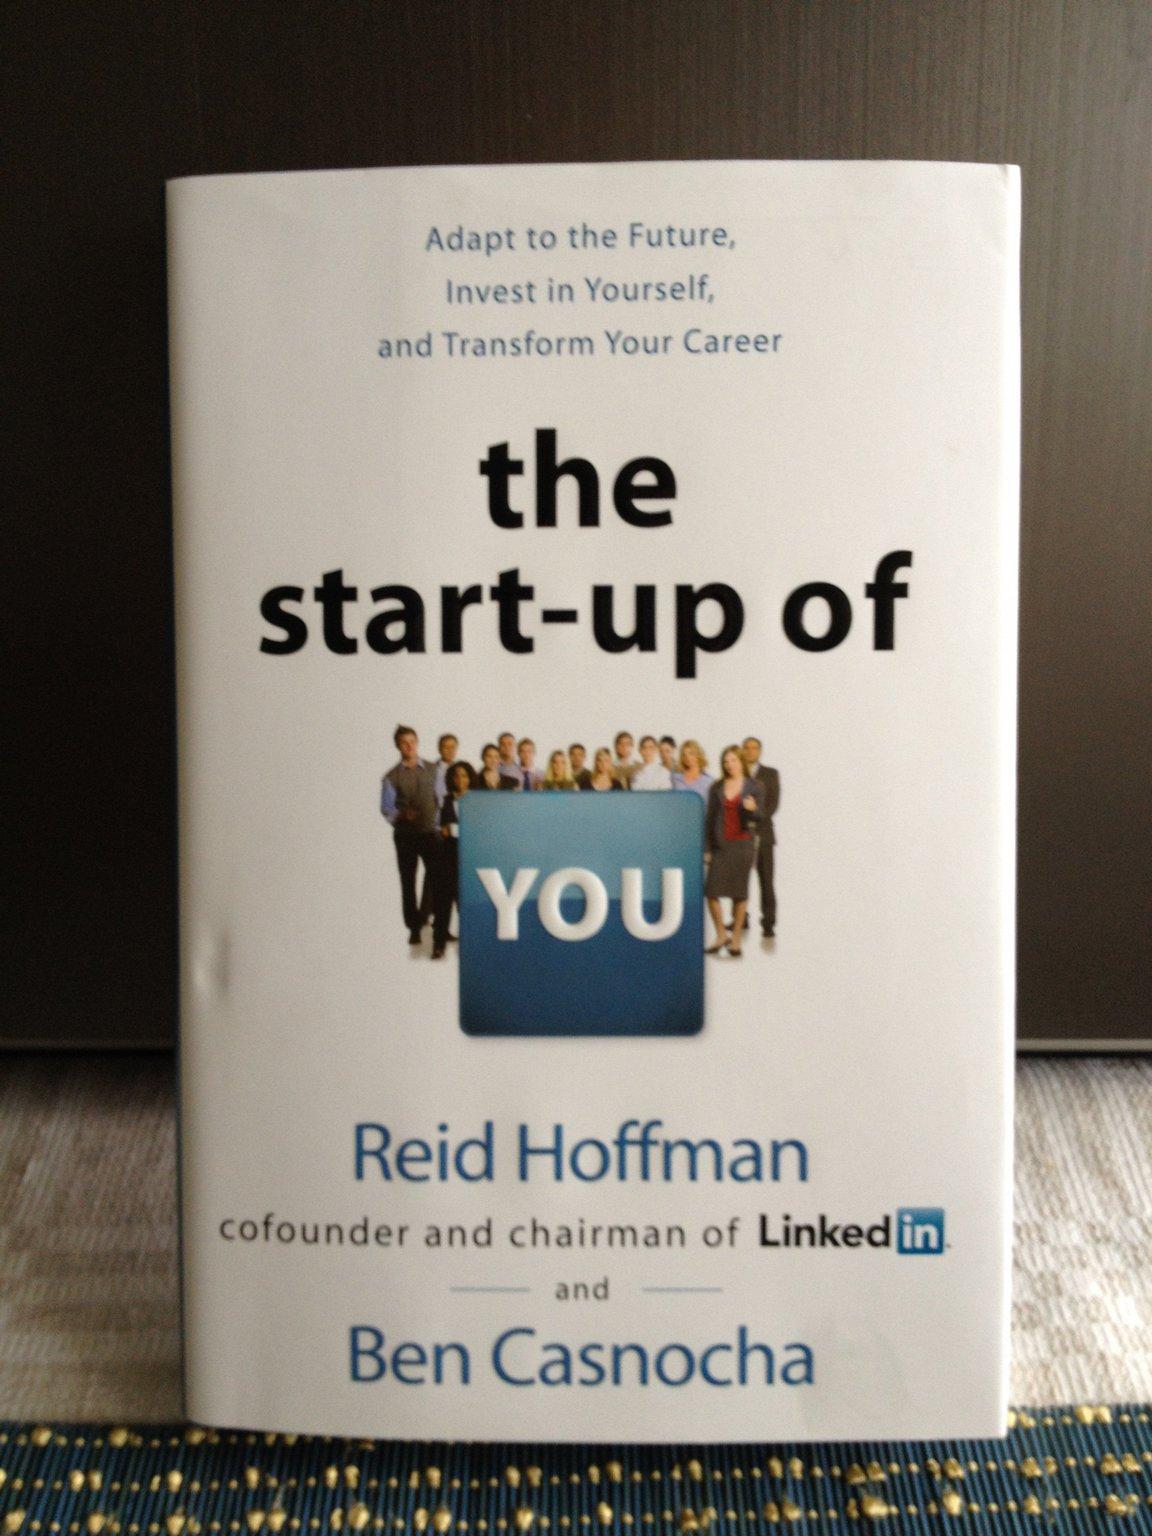 Kansikuva-Hoffman-The-startup-of-you-e1338713711919